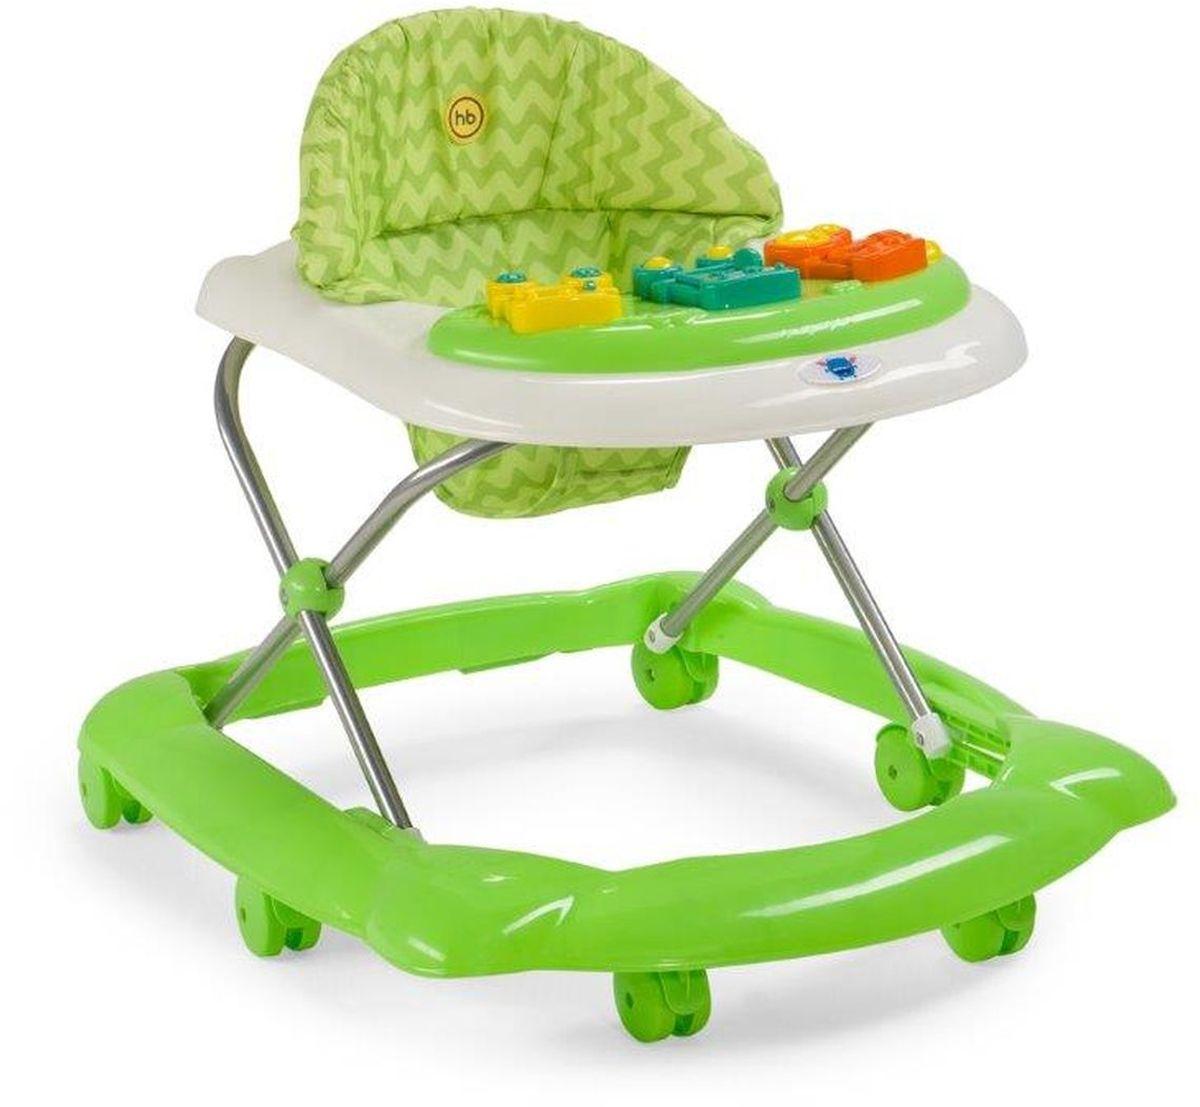 Happy Baby Ходунки Pioneer цвет зеленый -  Ходунки, прыгунки, качалки